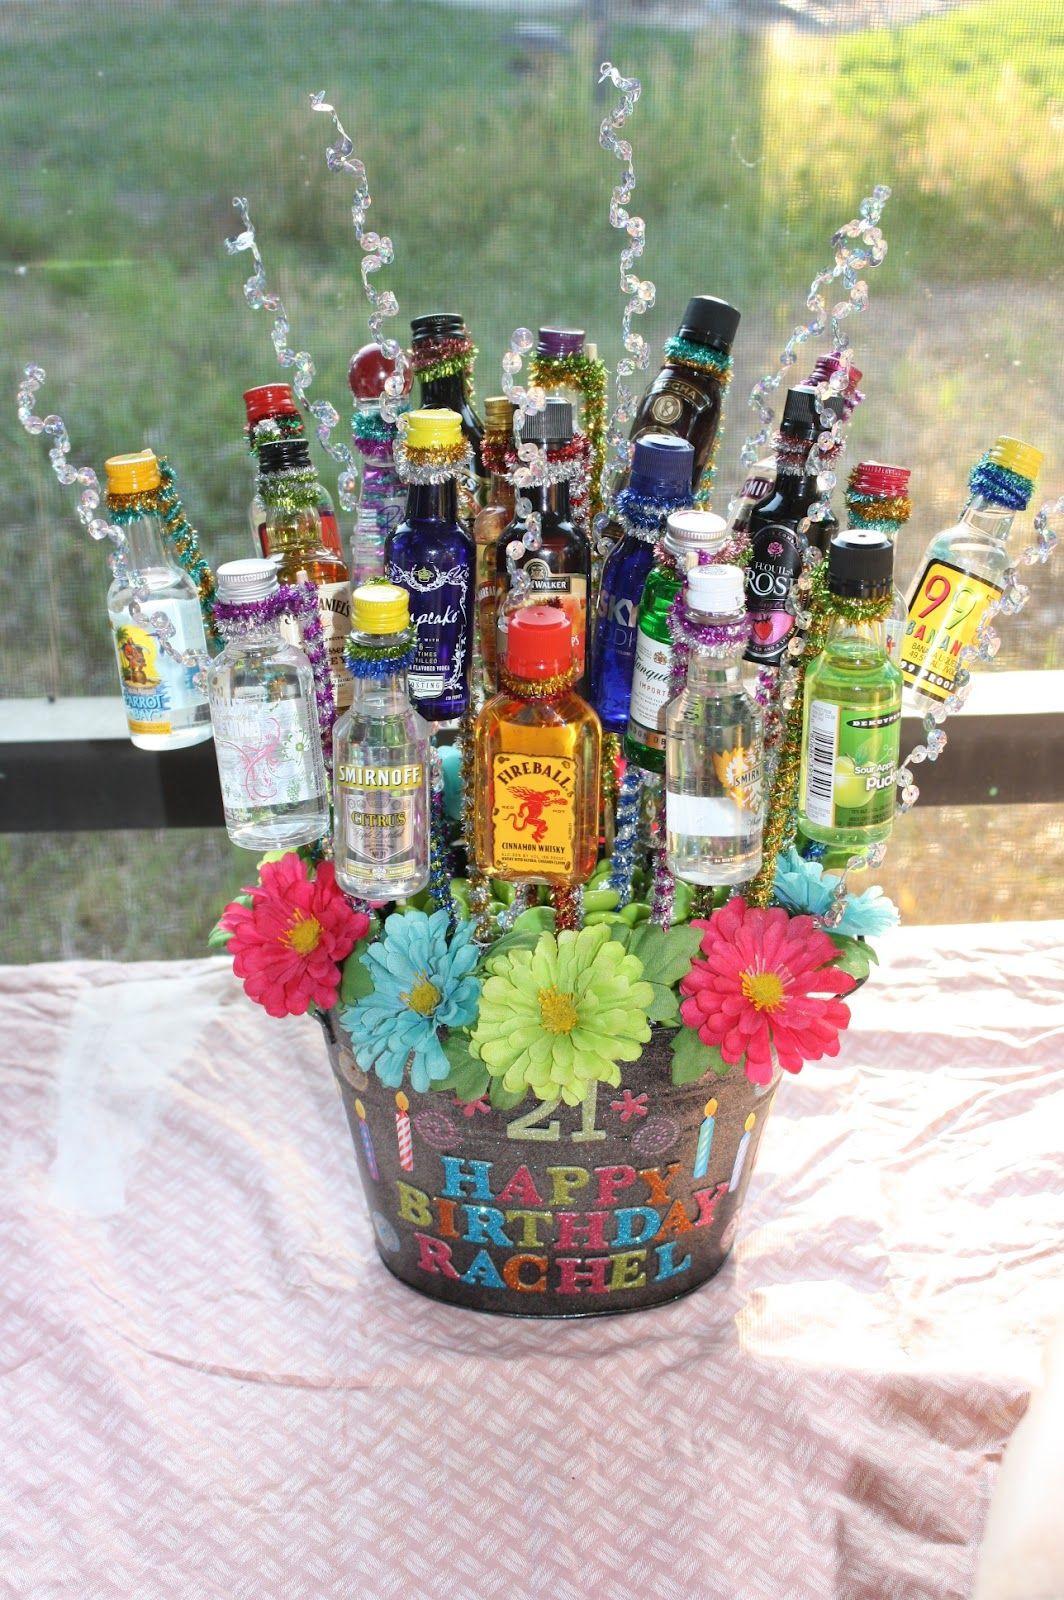 21St Birthday Gifts  Alcohol Basket on Pinterest